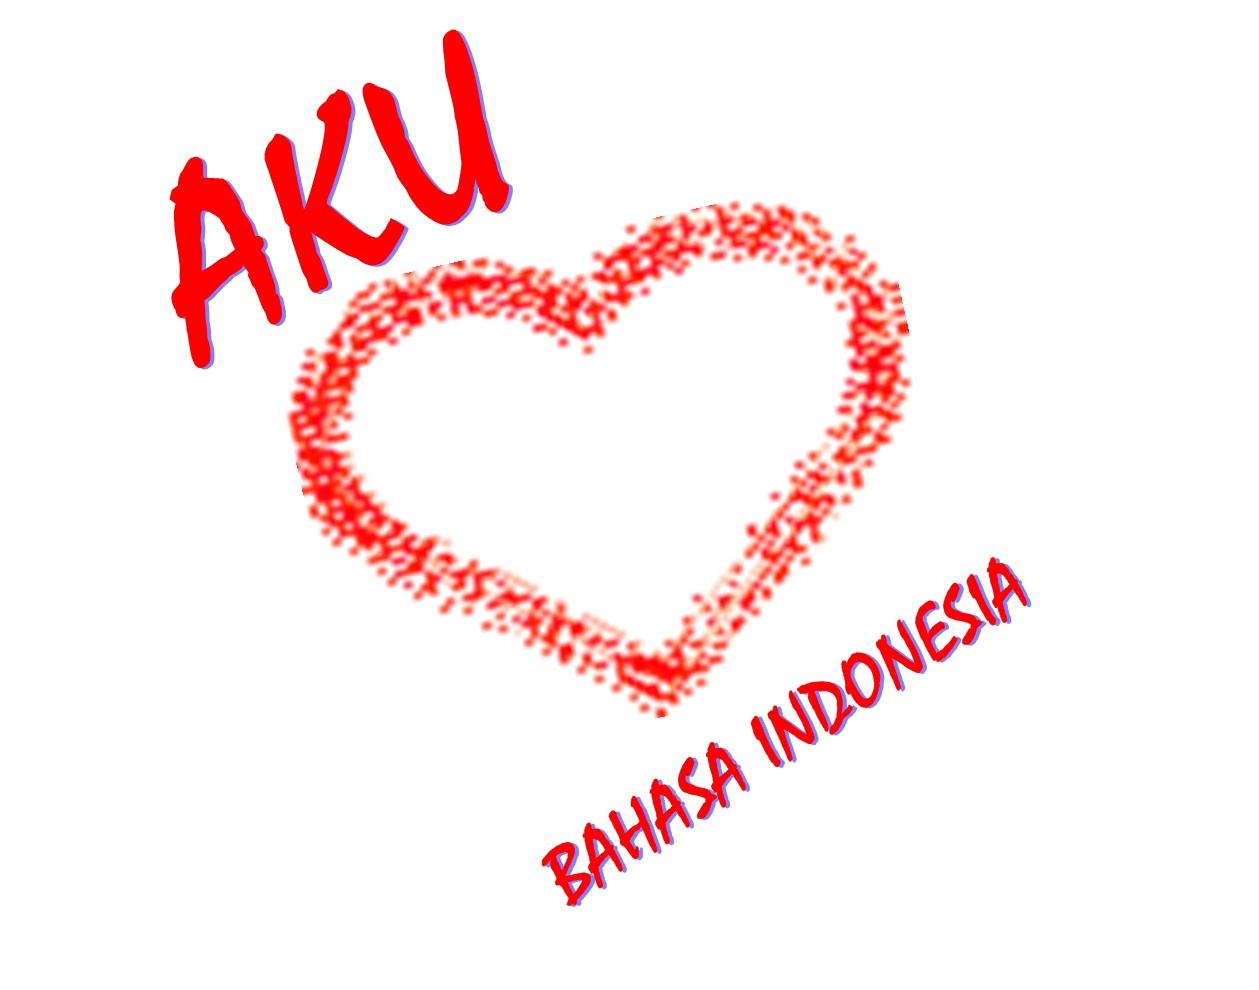 Belajar Bahasa Indonesia Nonikhairani